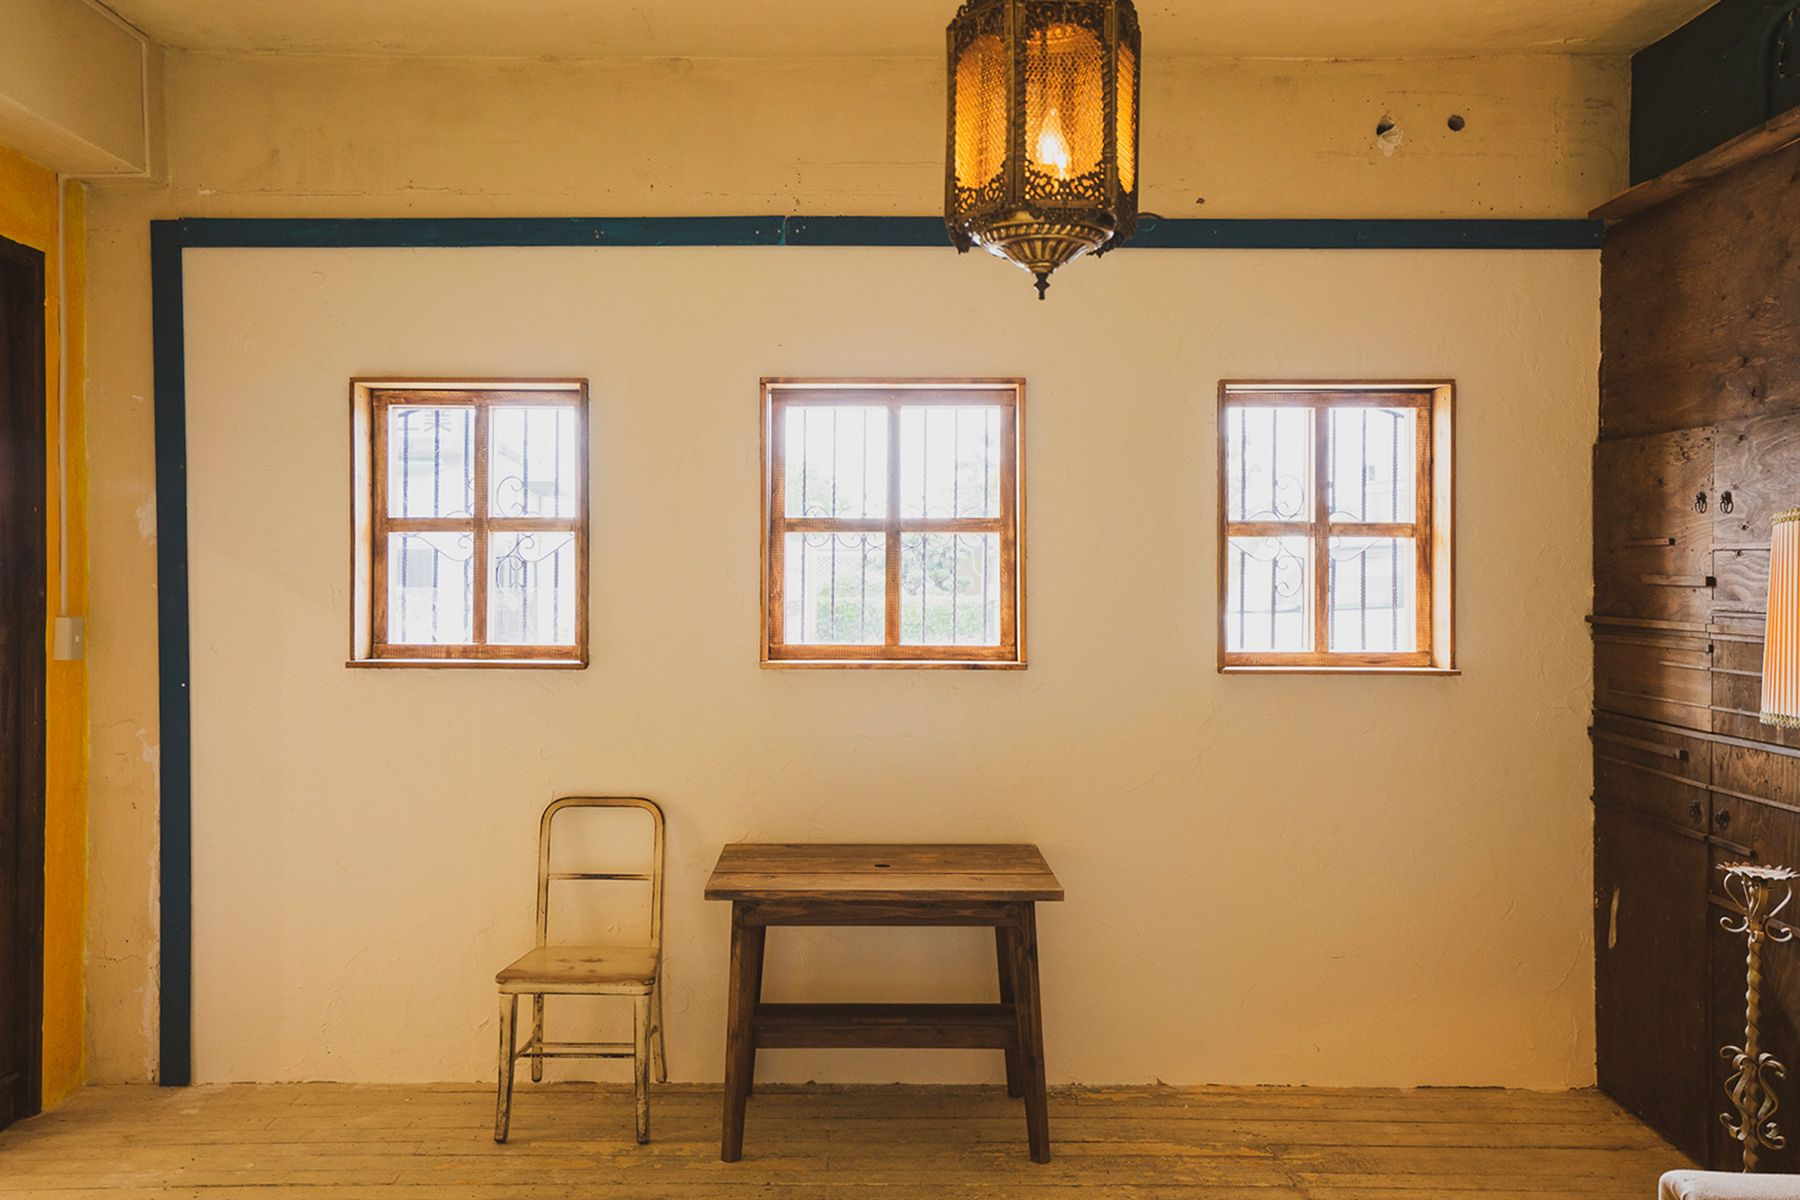 OKINAWA Rycom Studio (沖縄ライカムスタジオ)bed room